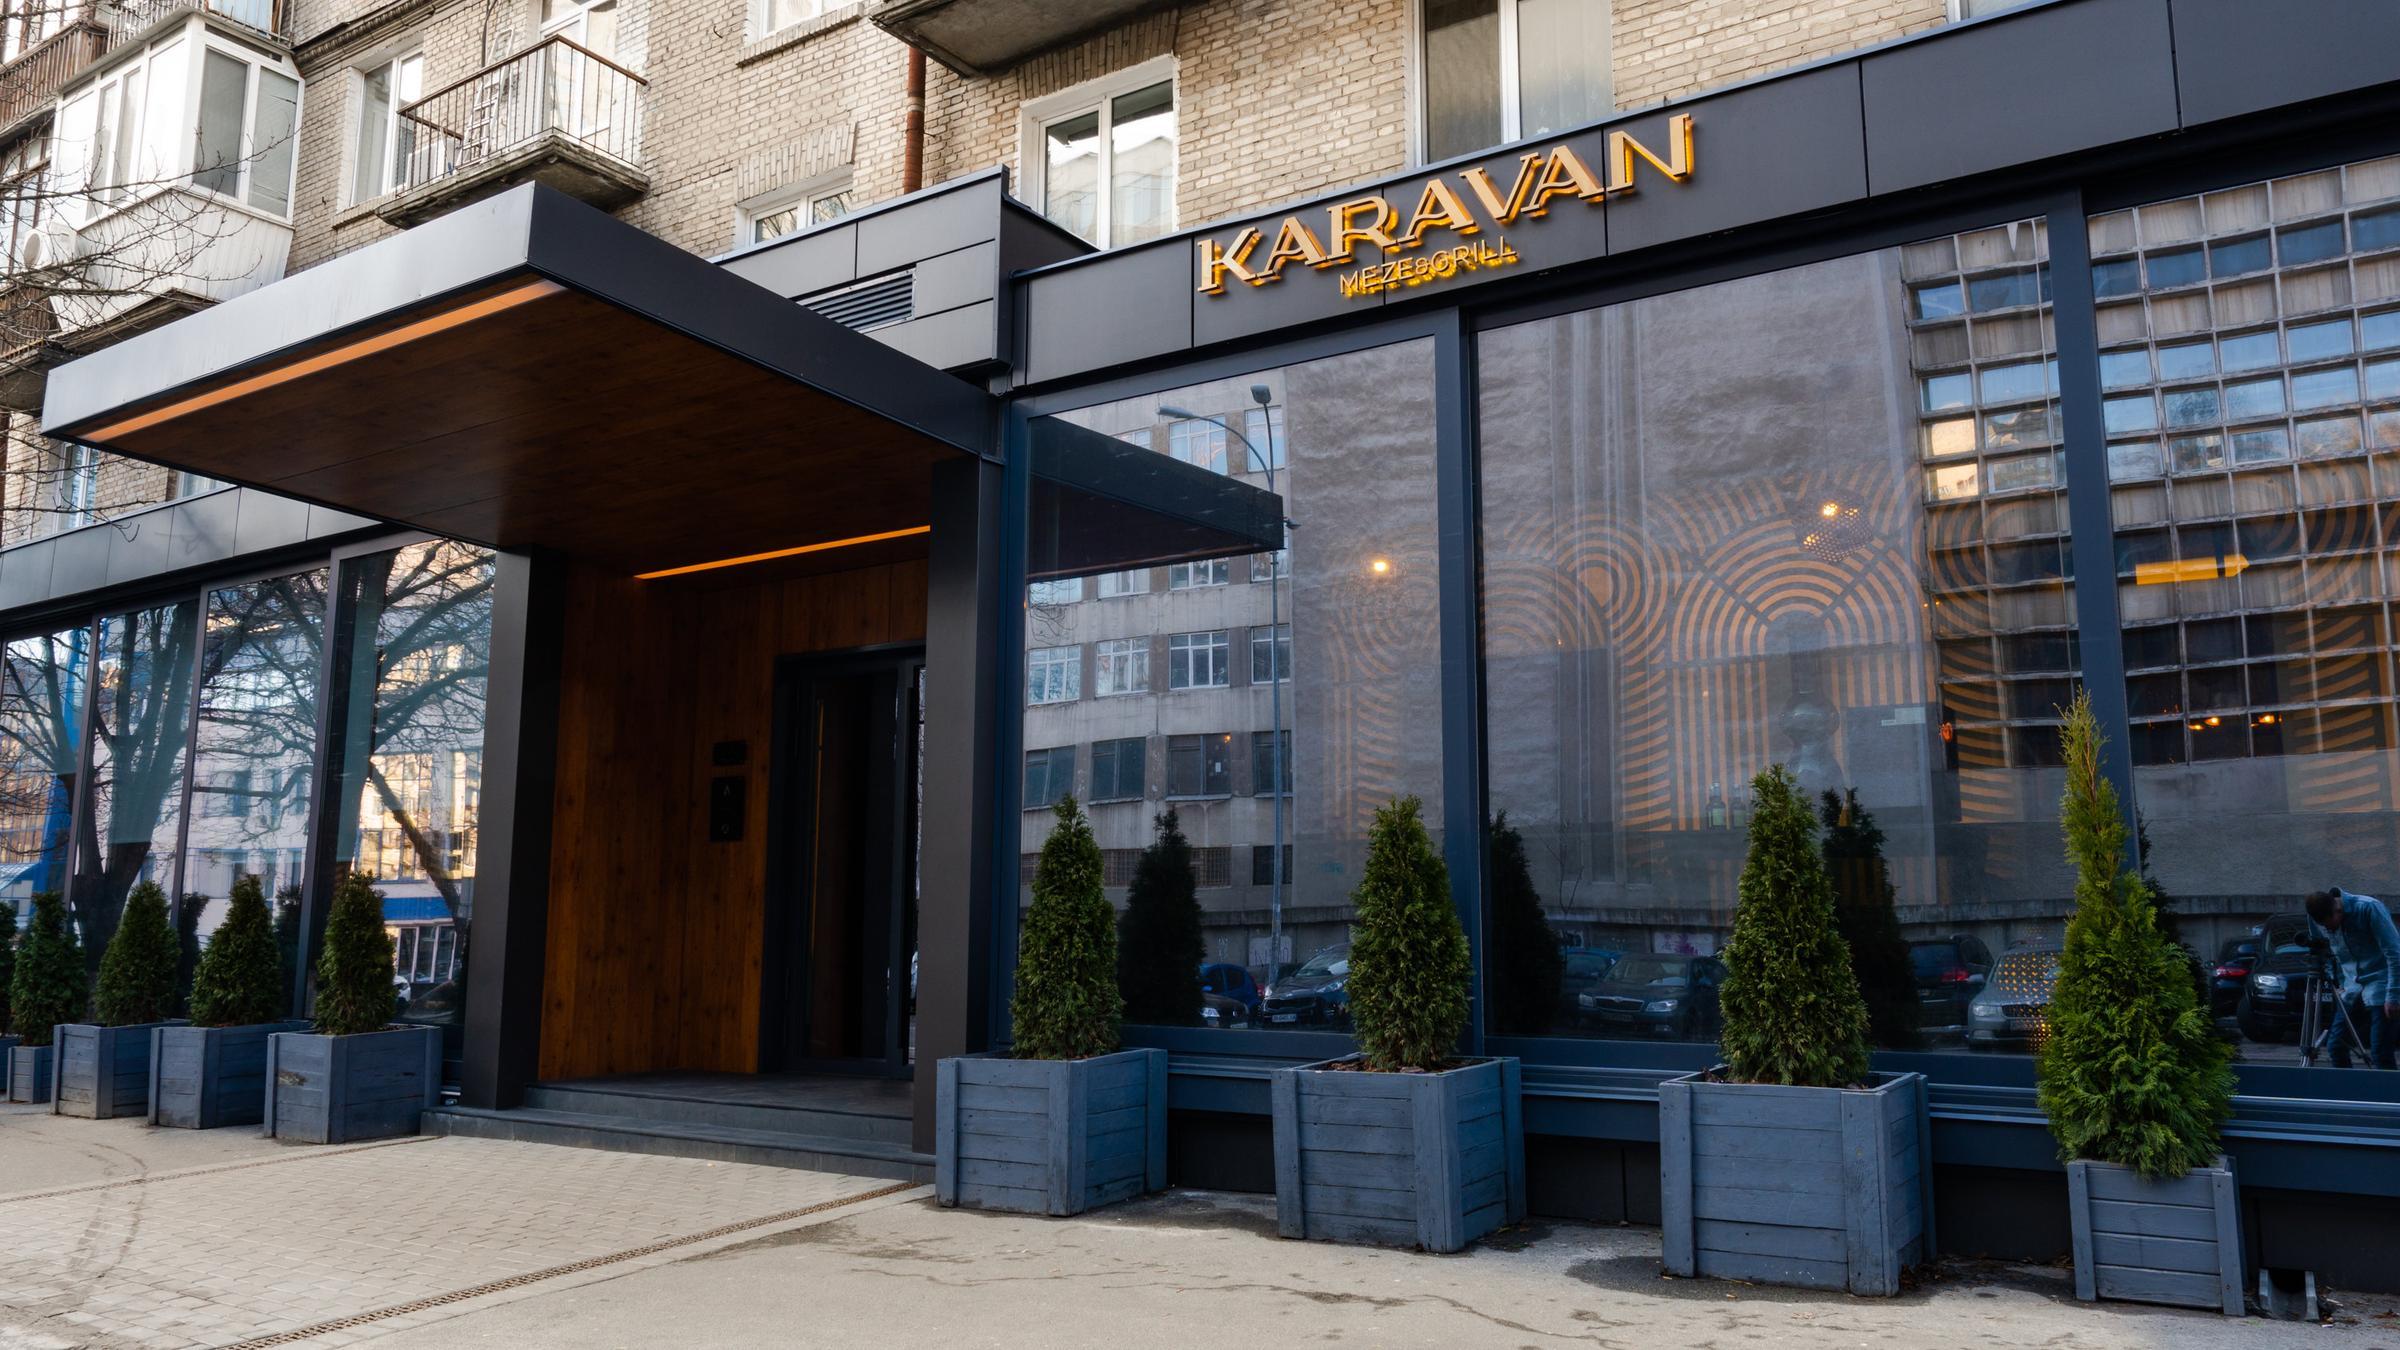 фотография Ресторана Караван на улице Кловского спуска